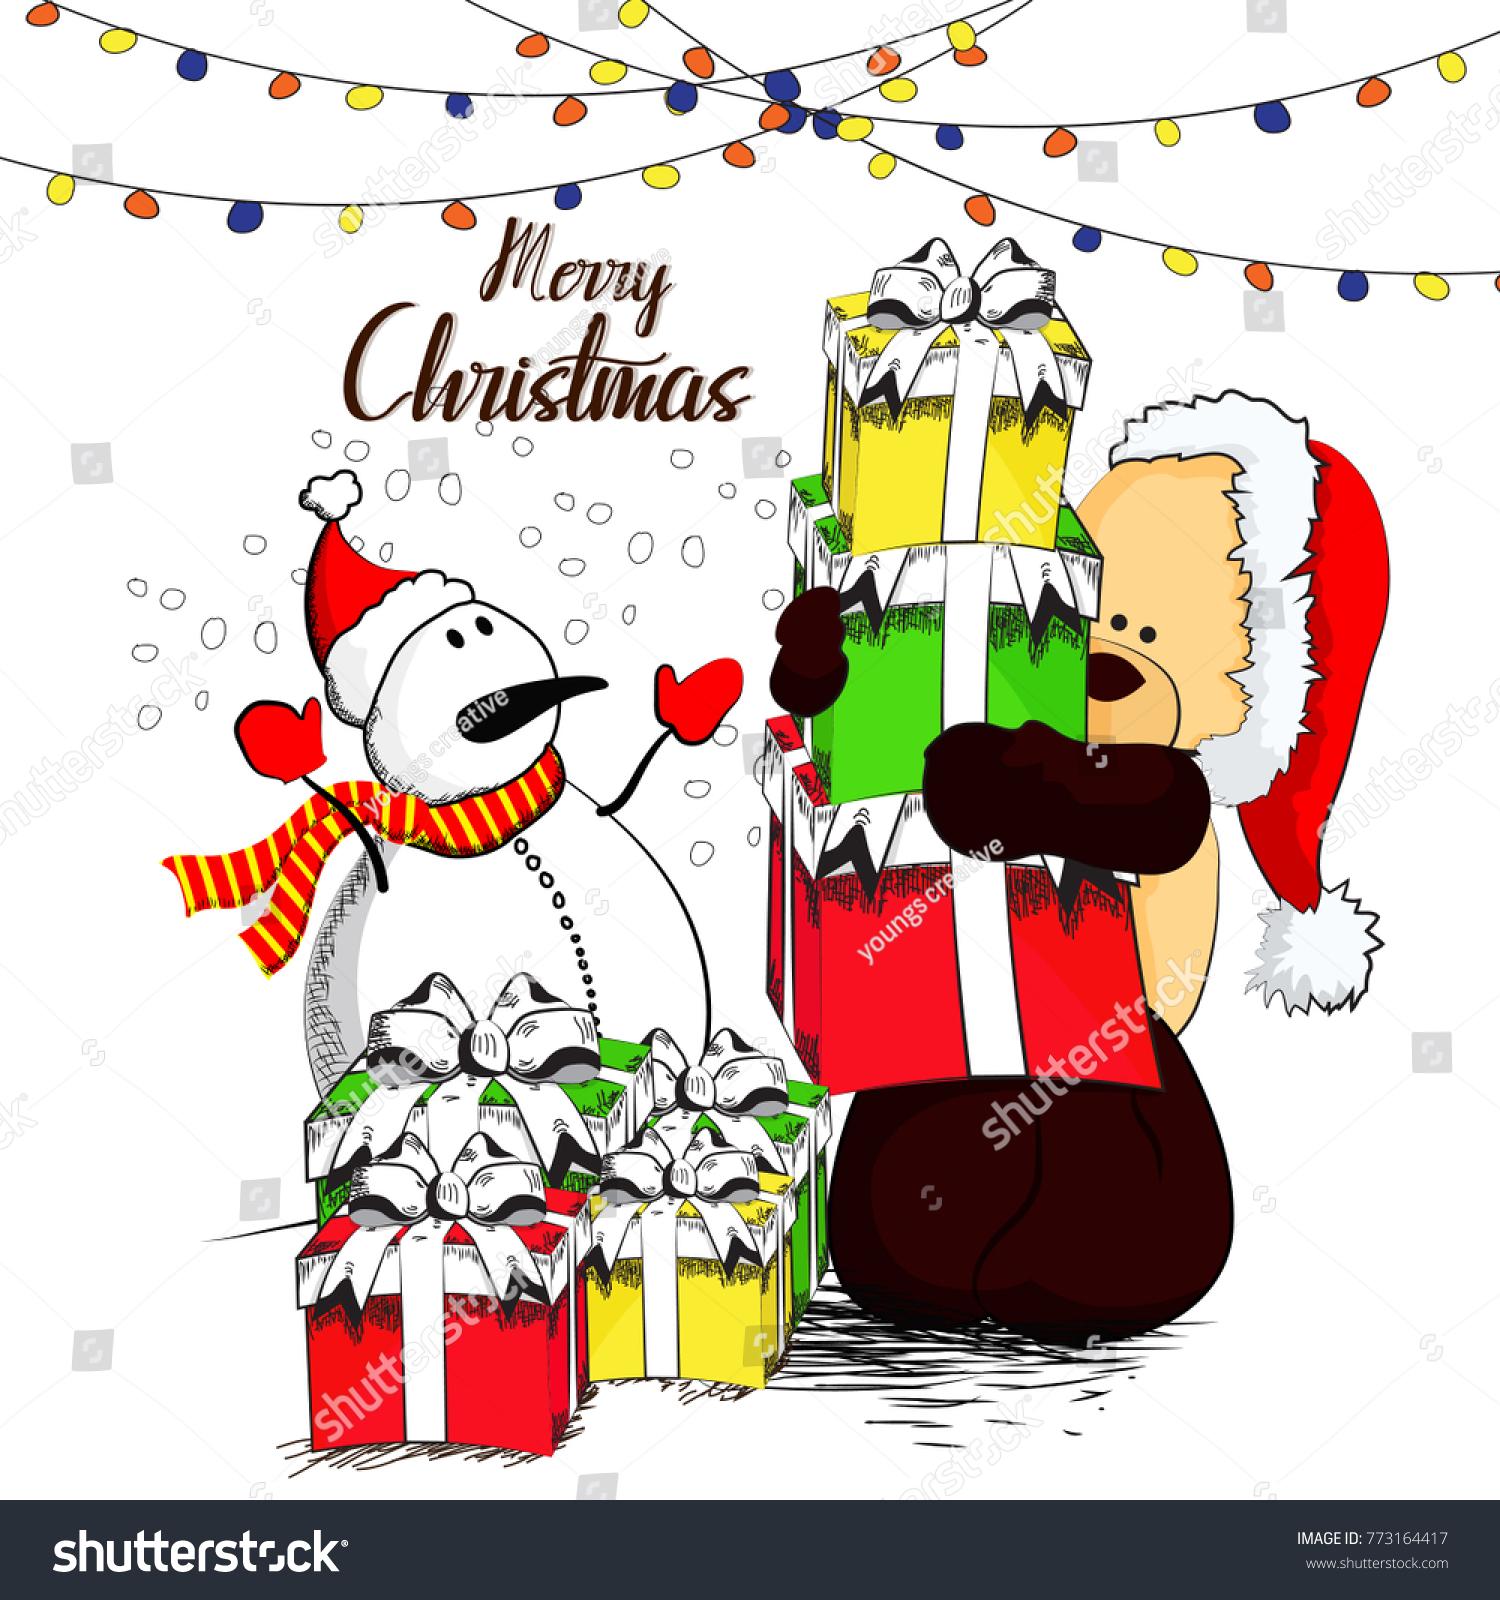 Christmas Birth Jesus Christ Stock Vector (Royalty Free) 773164417 ...